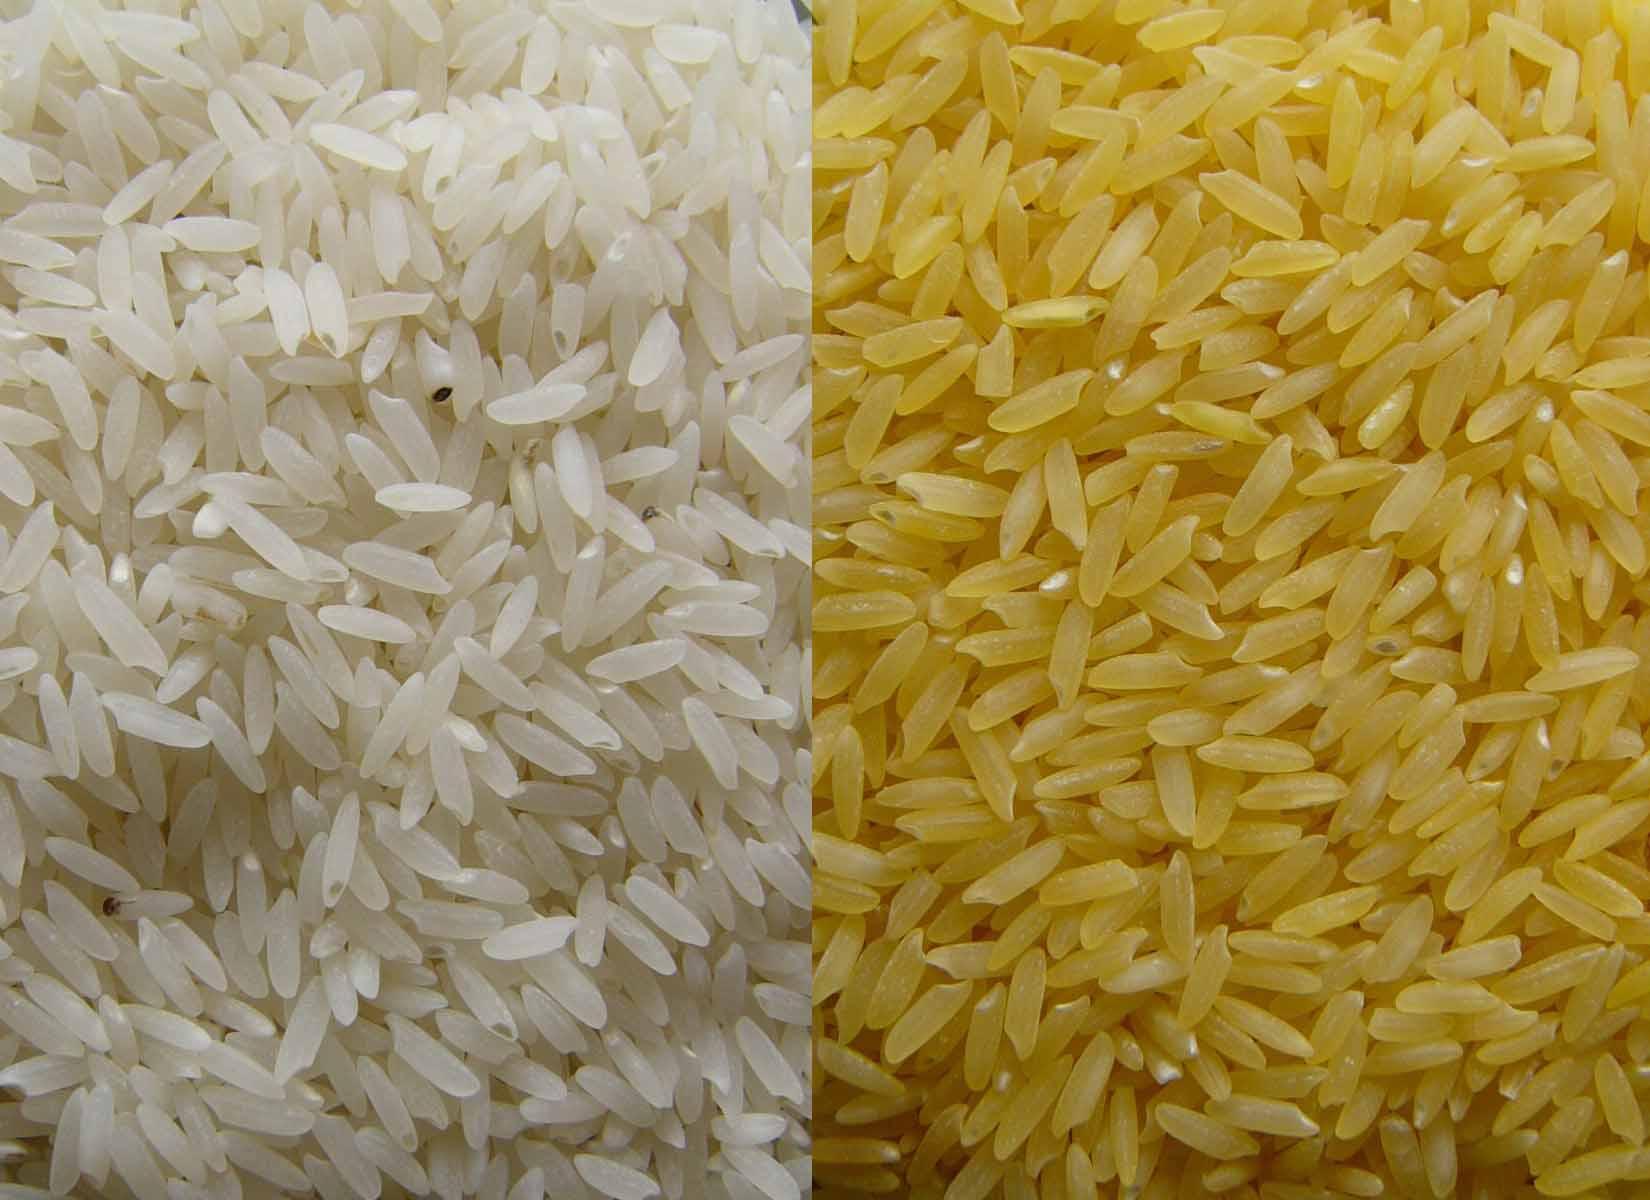 Nobel Laureates Slam Greenpeace's Opposition to GMOs, Golden Rice